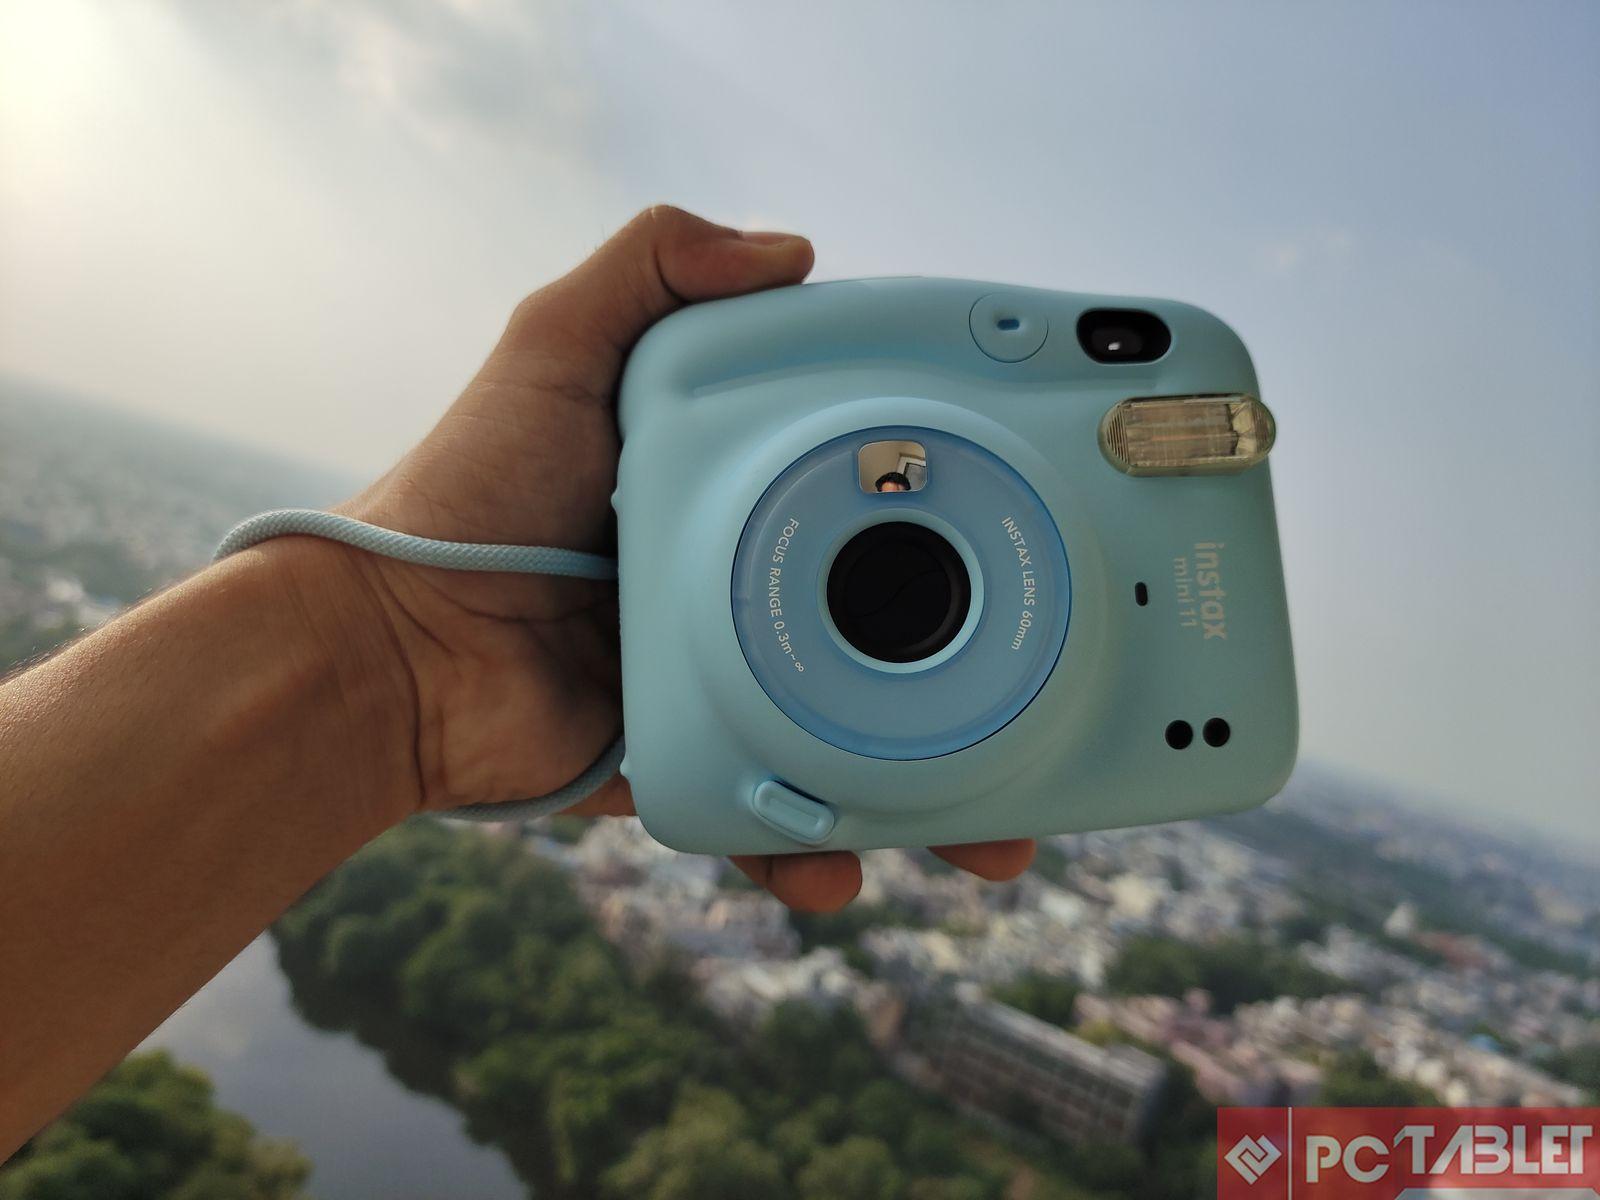 Fujifilm Instax Mini 11 Review 5